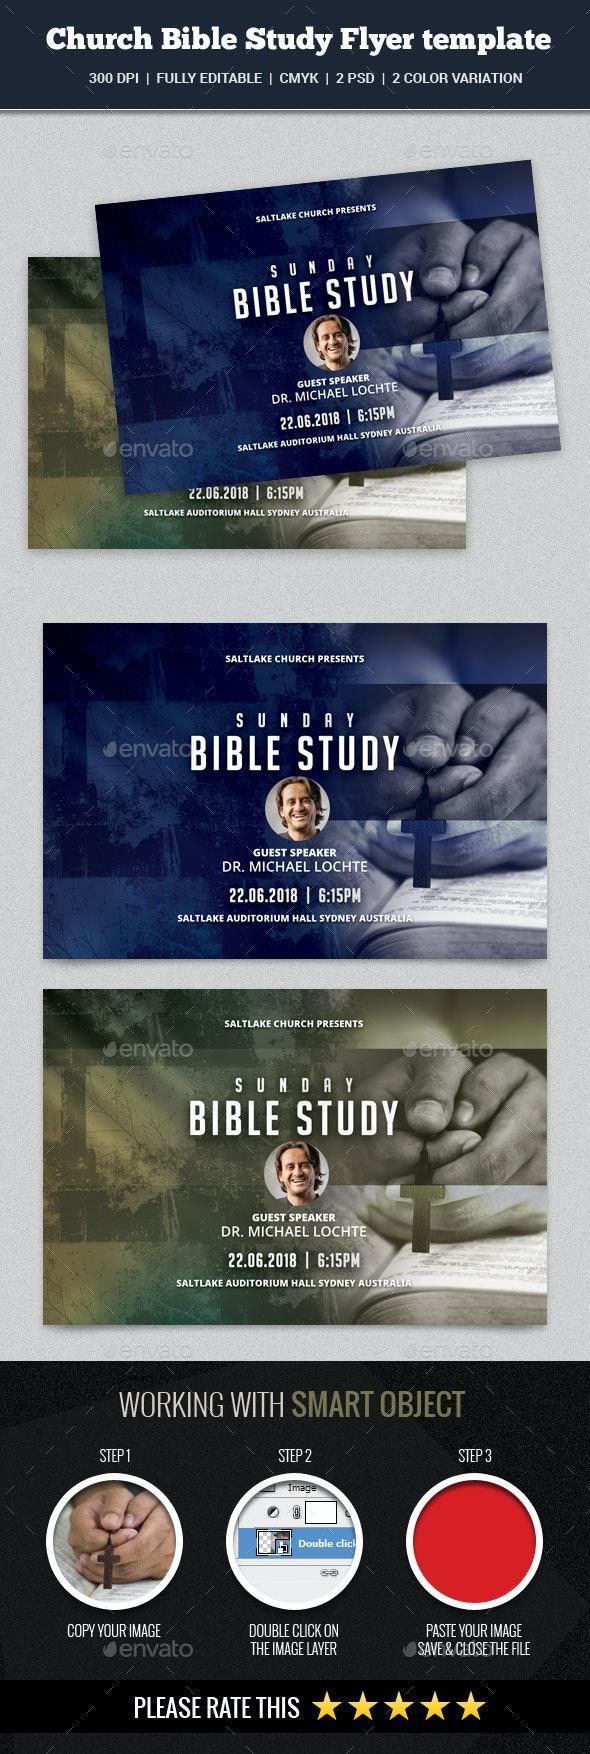 Church Bible Study Flyer - Church Flyers